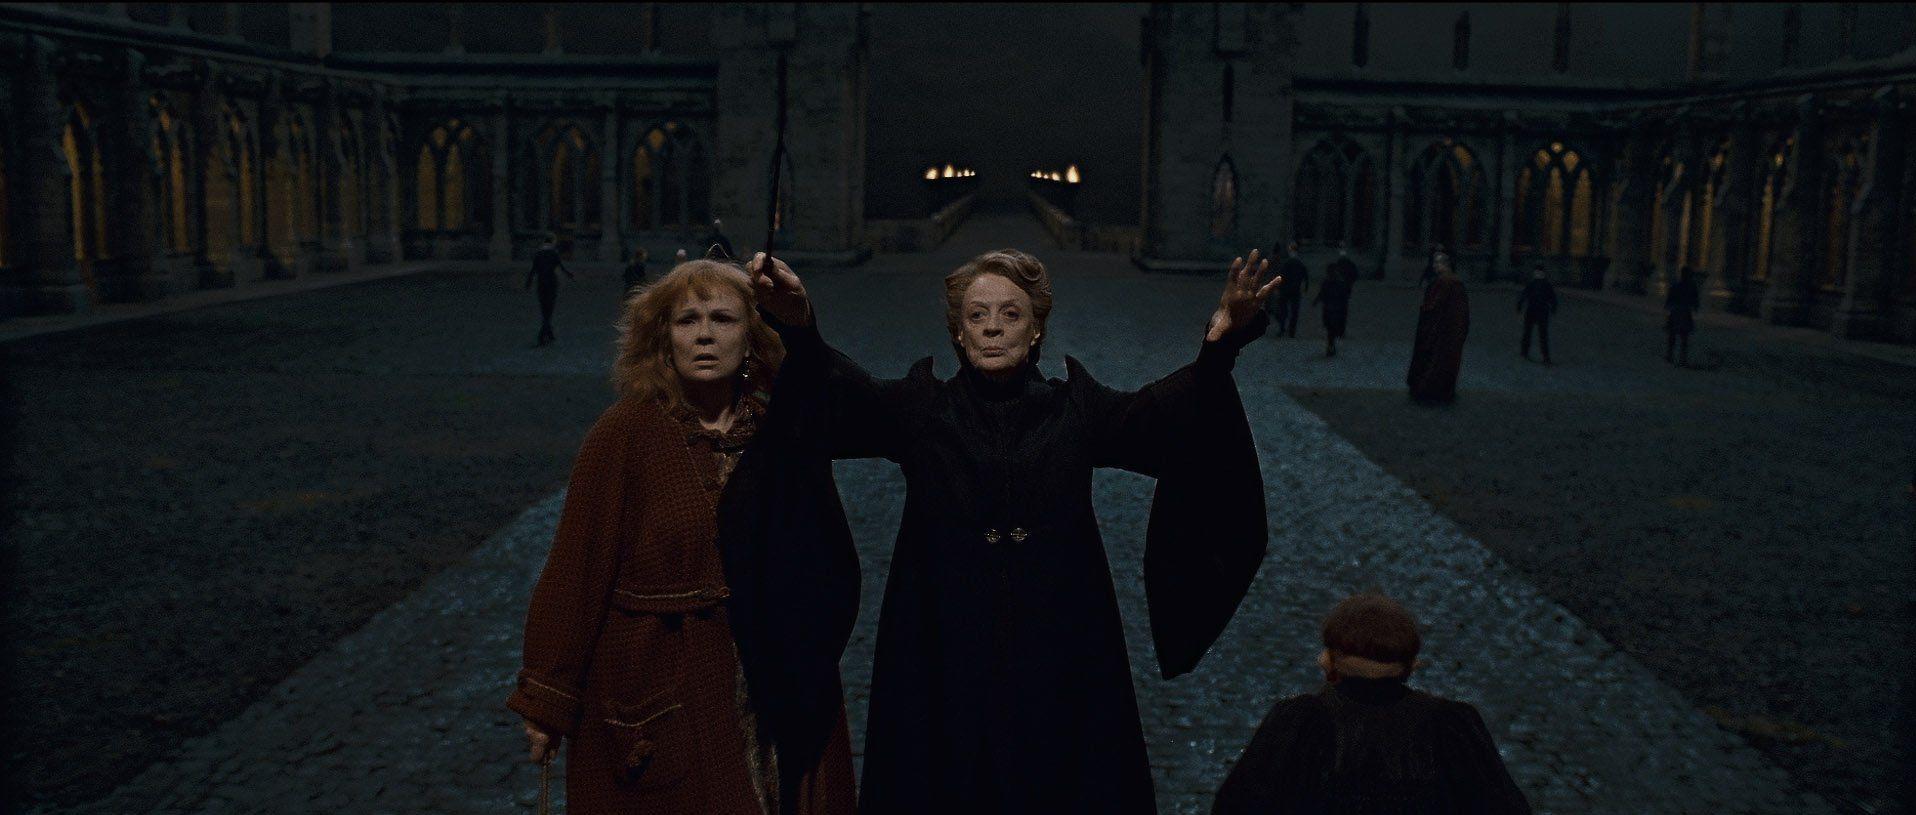 "Hogwarts is threatened!"" shouted Professor McGonagall. ""Man the ..."